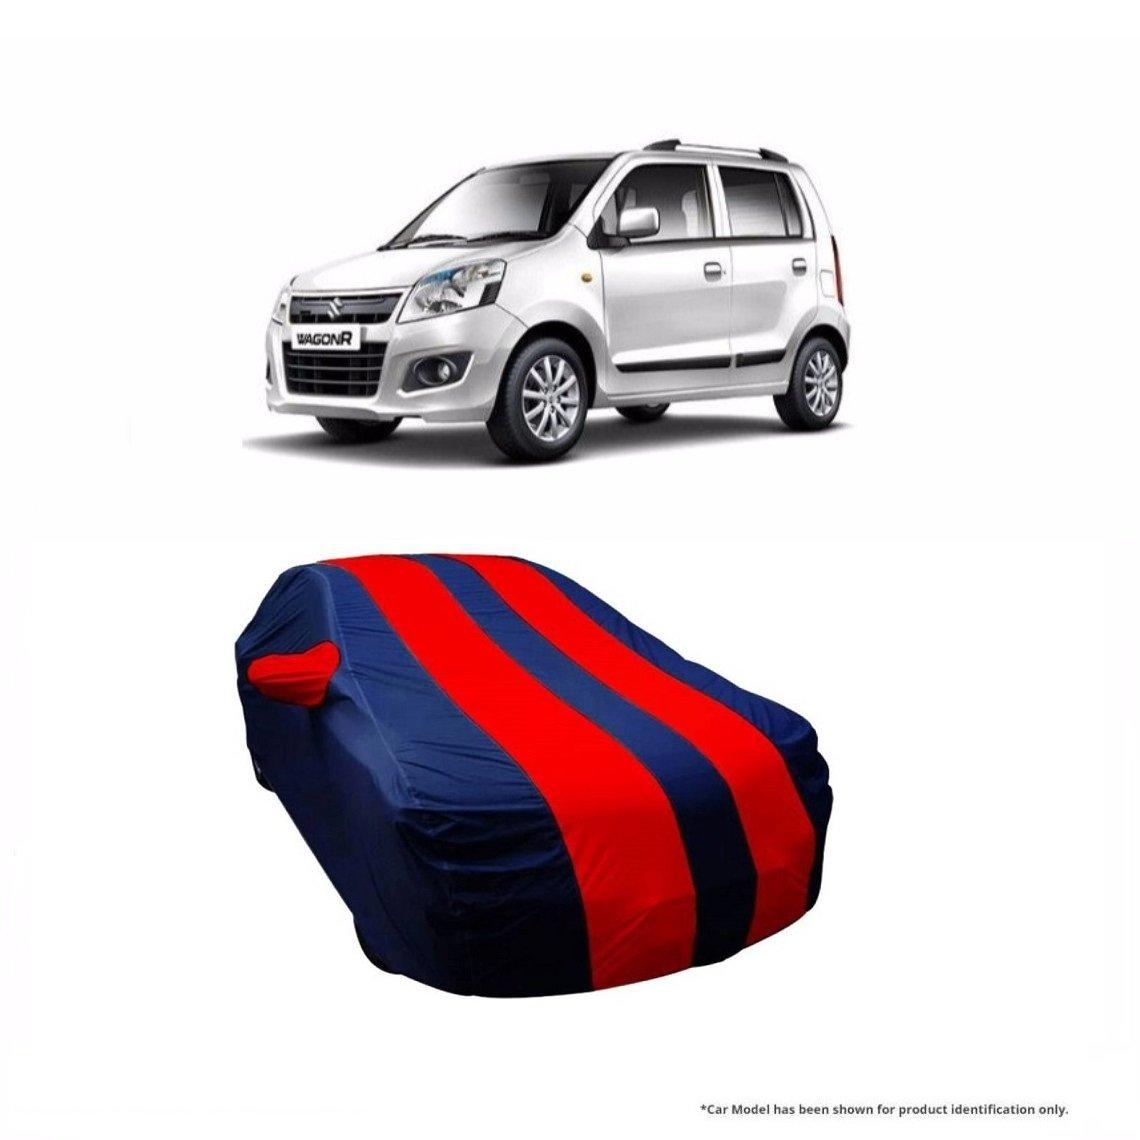 Motrox dual tone stripe car body cover for maruti suzuki wagonr navy blue with red stripe amazon in car motorbike